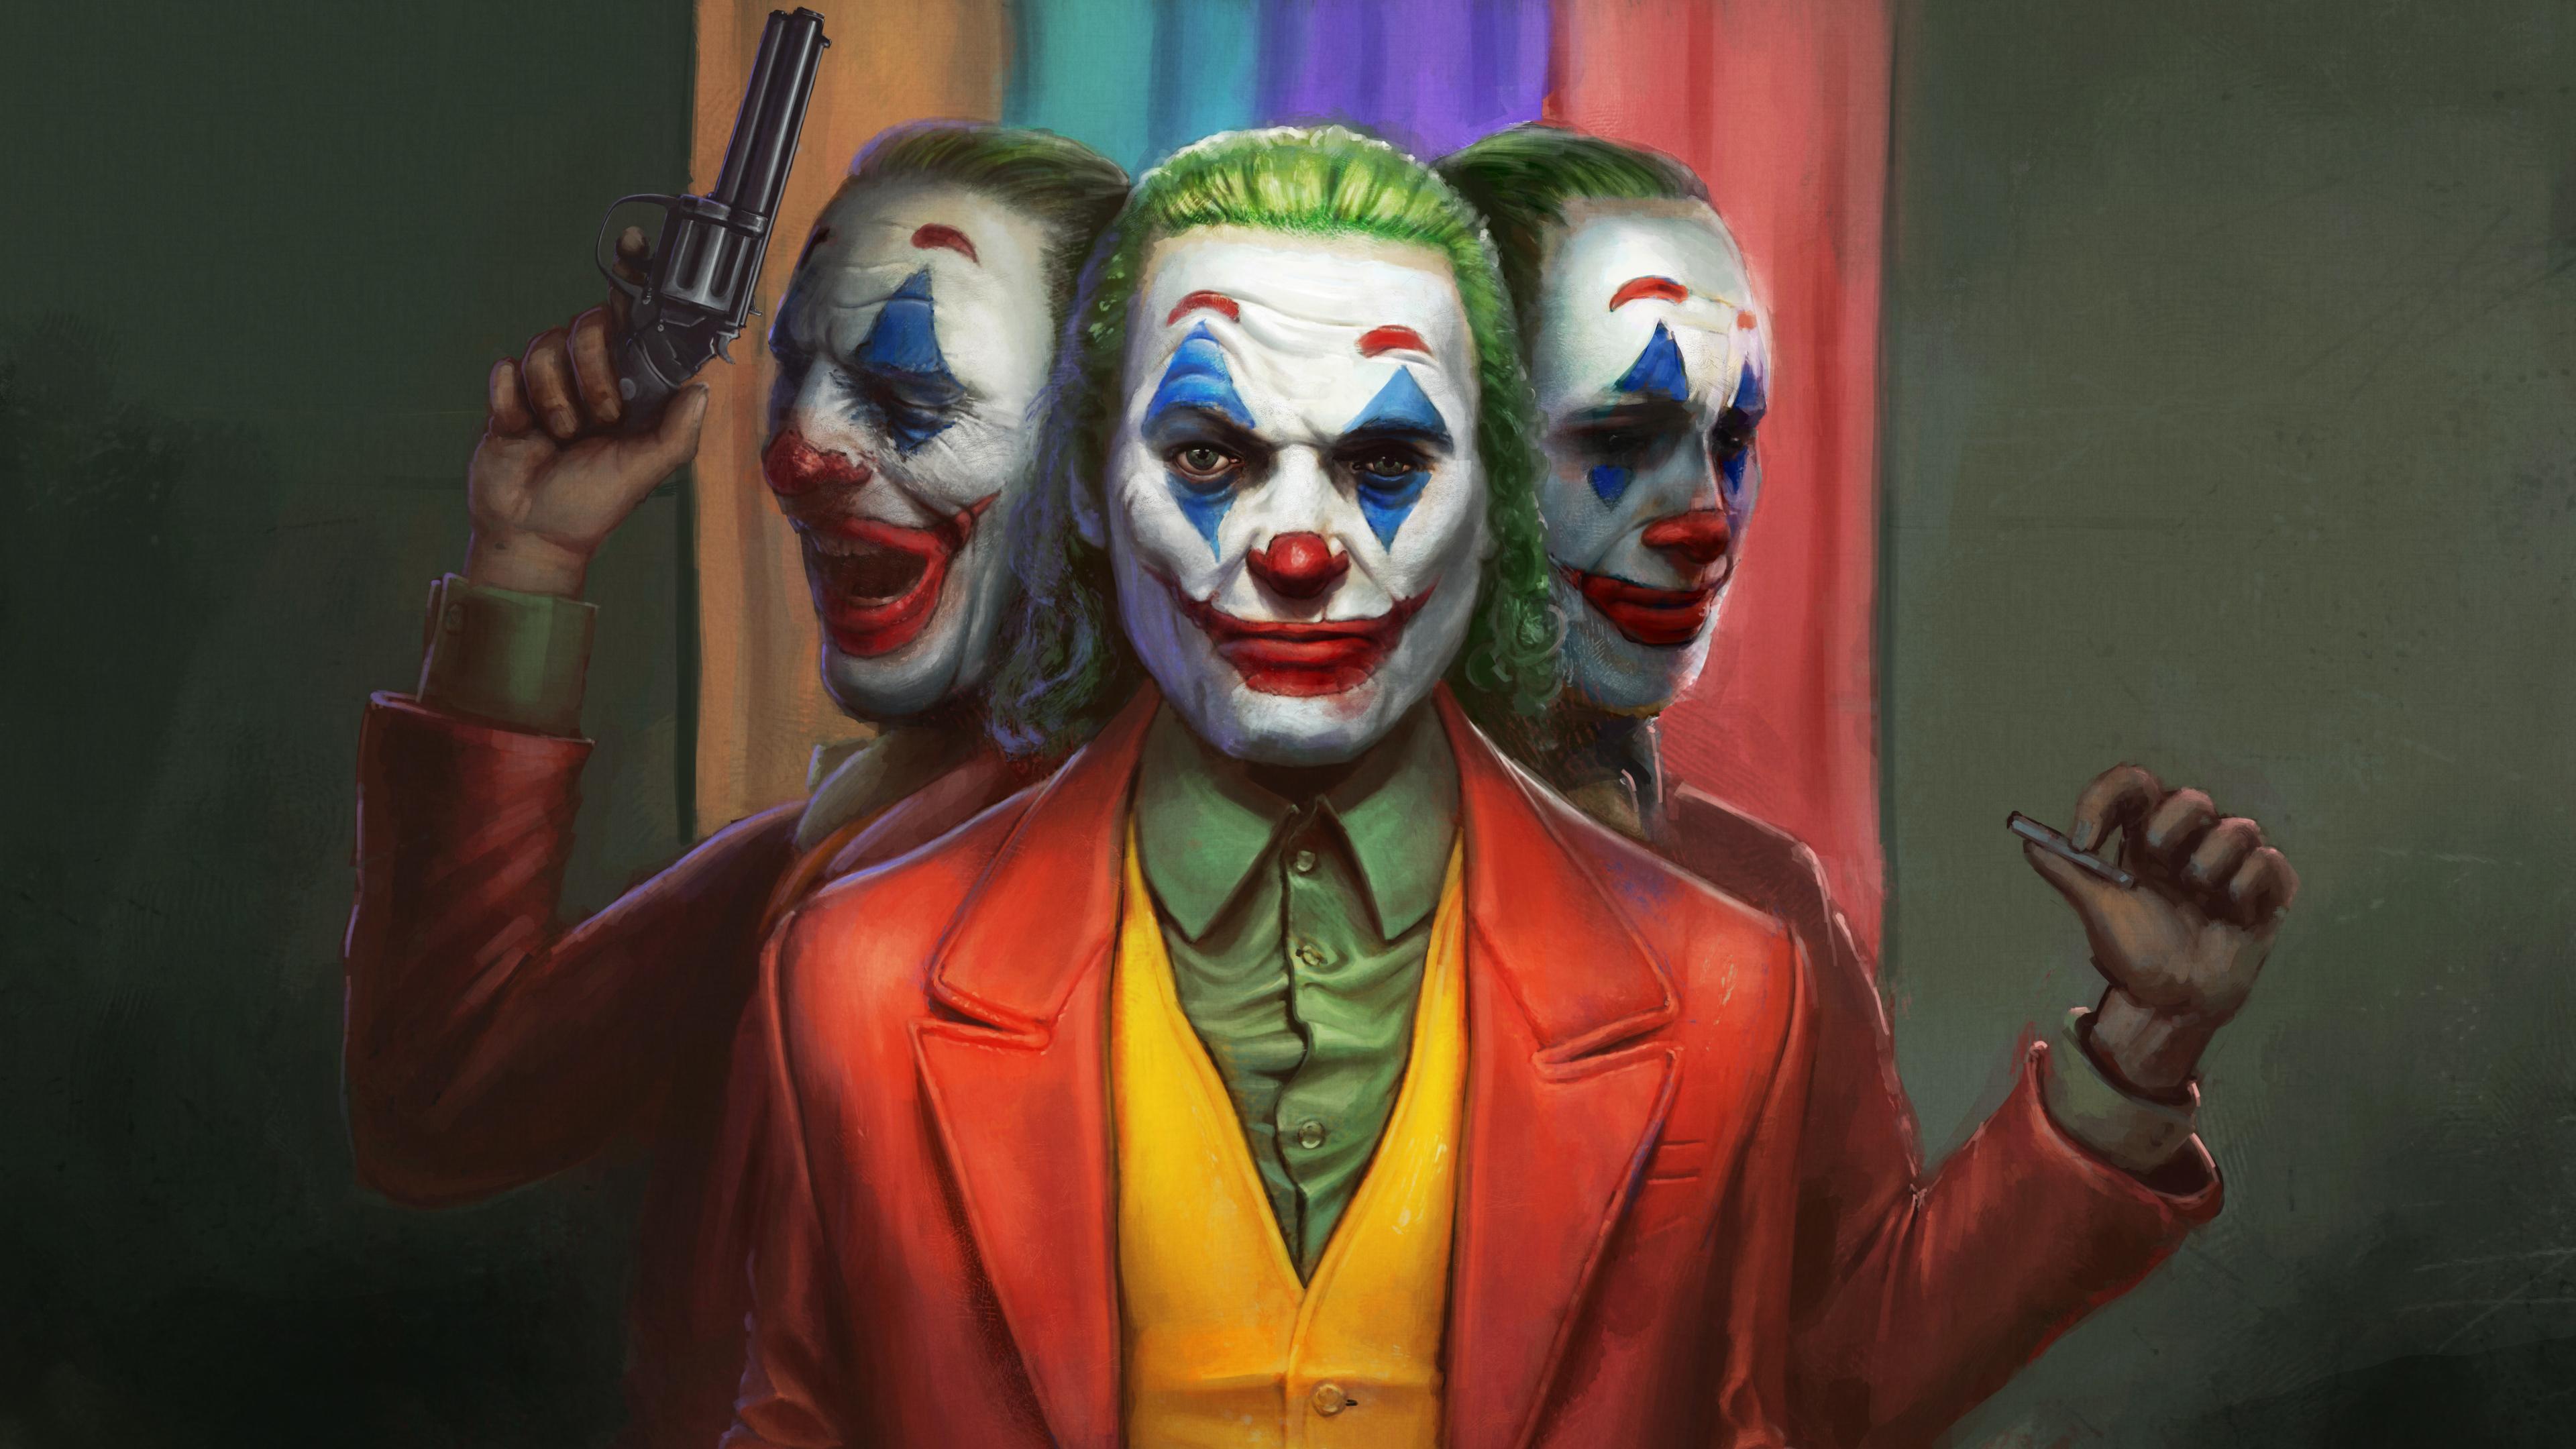 joker art movie 1572369007 - Joker Art Movie - supervillain wallpapers, superheroes wallpapers, joker wallpapers, joker movie wallpapers, hd-wallpapers, 5k wallpapers, 4k-wallpapers